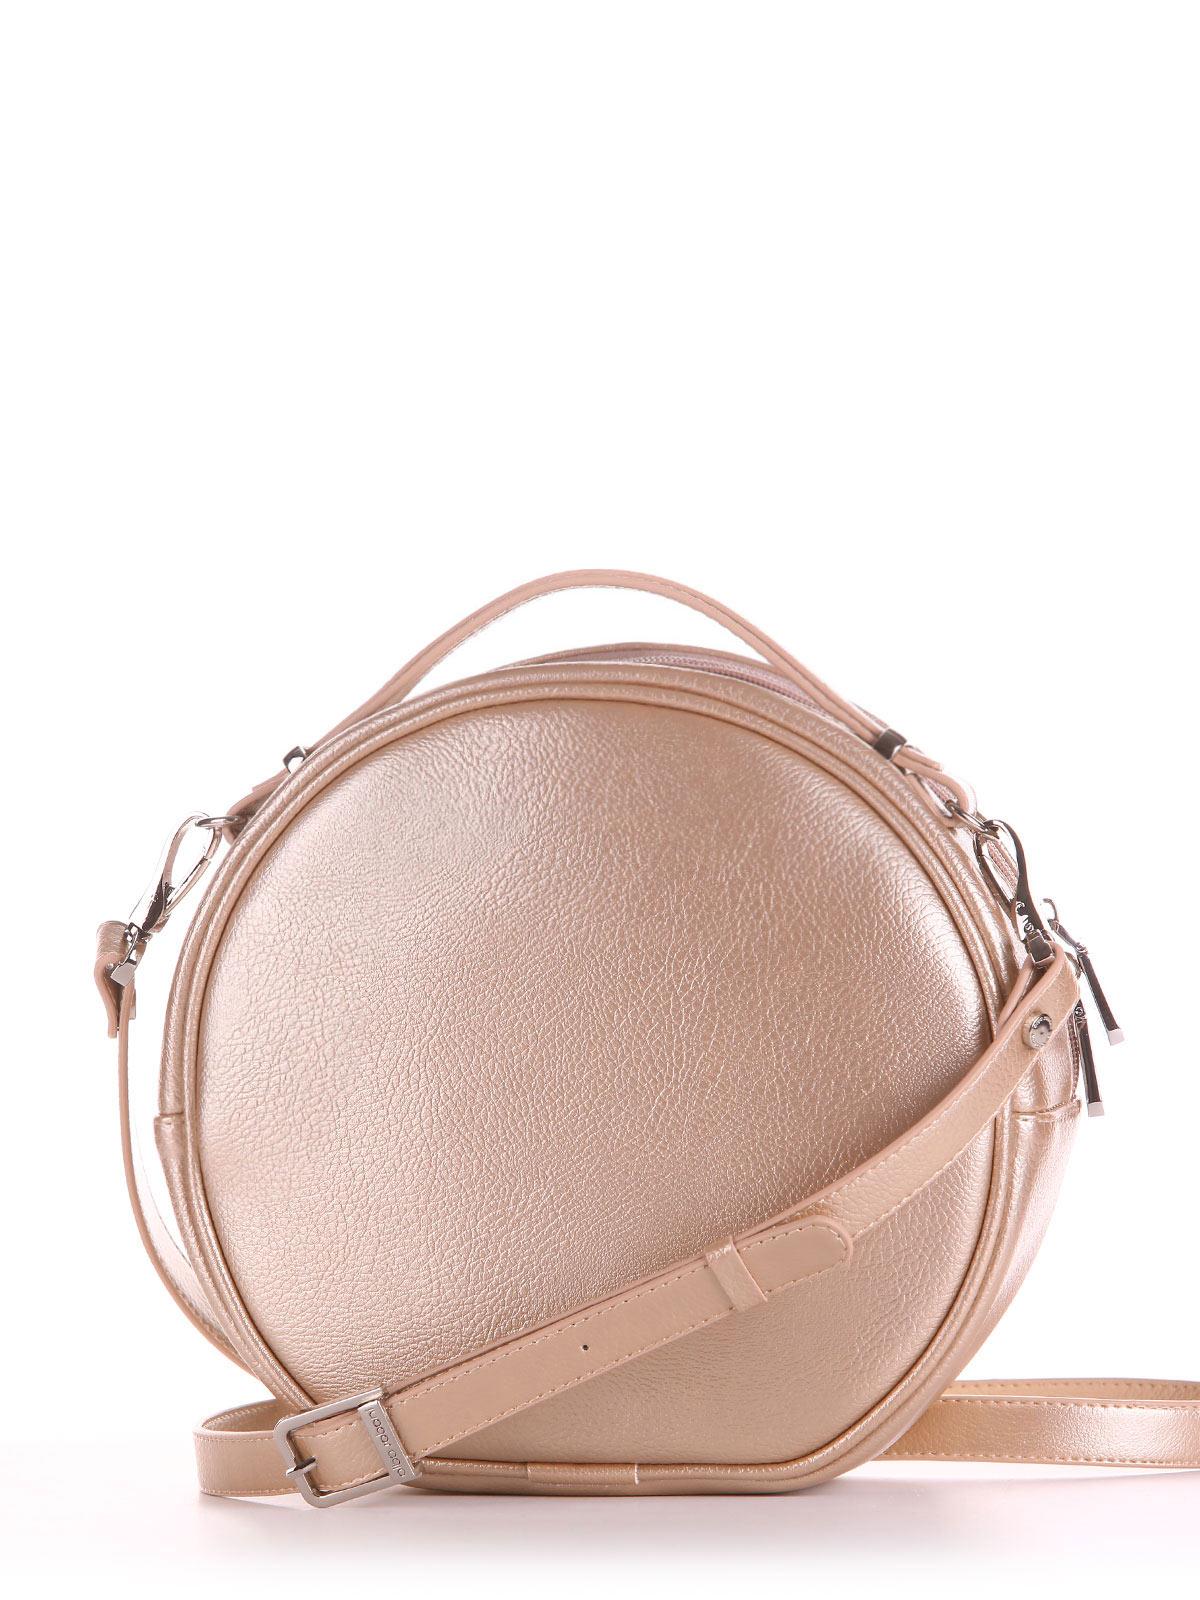 b90d916566da Фото товара, вид сбоку Модная сумка через плечо, модель 190167  золото-перламутр. Фото товара, вид сзади